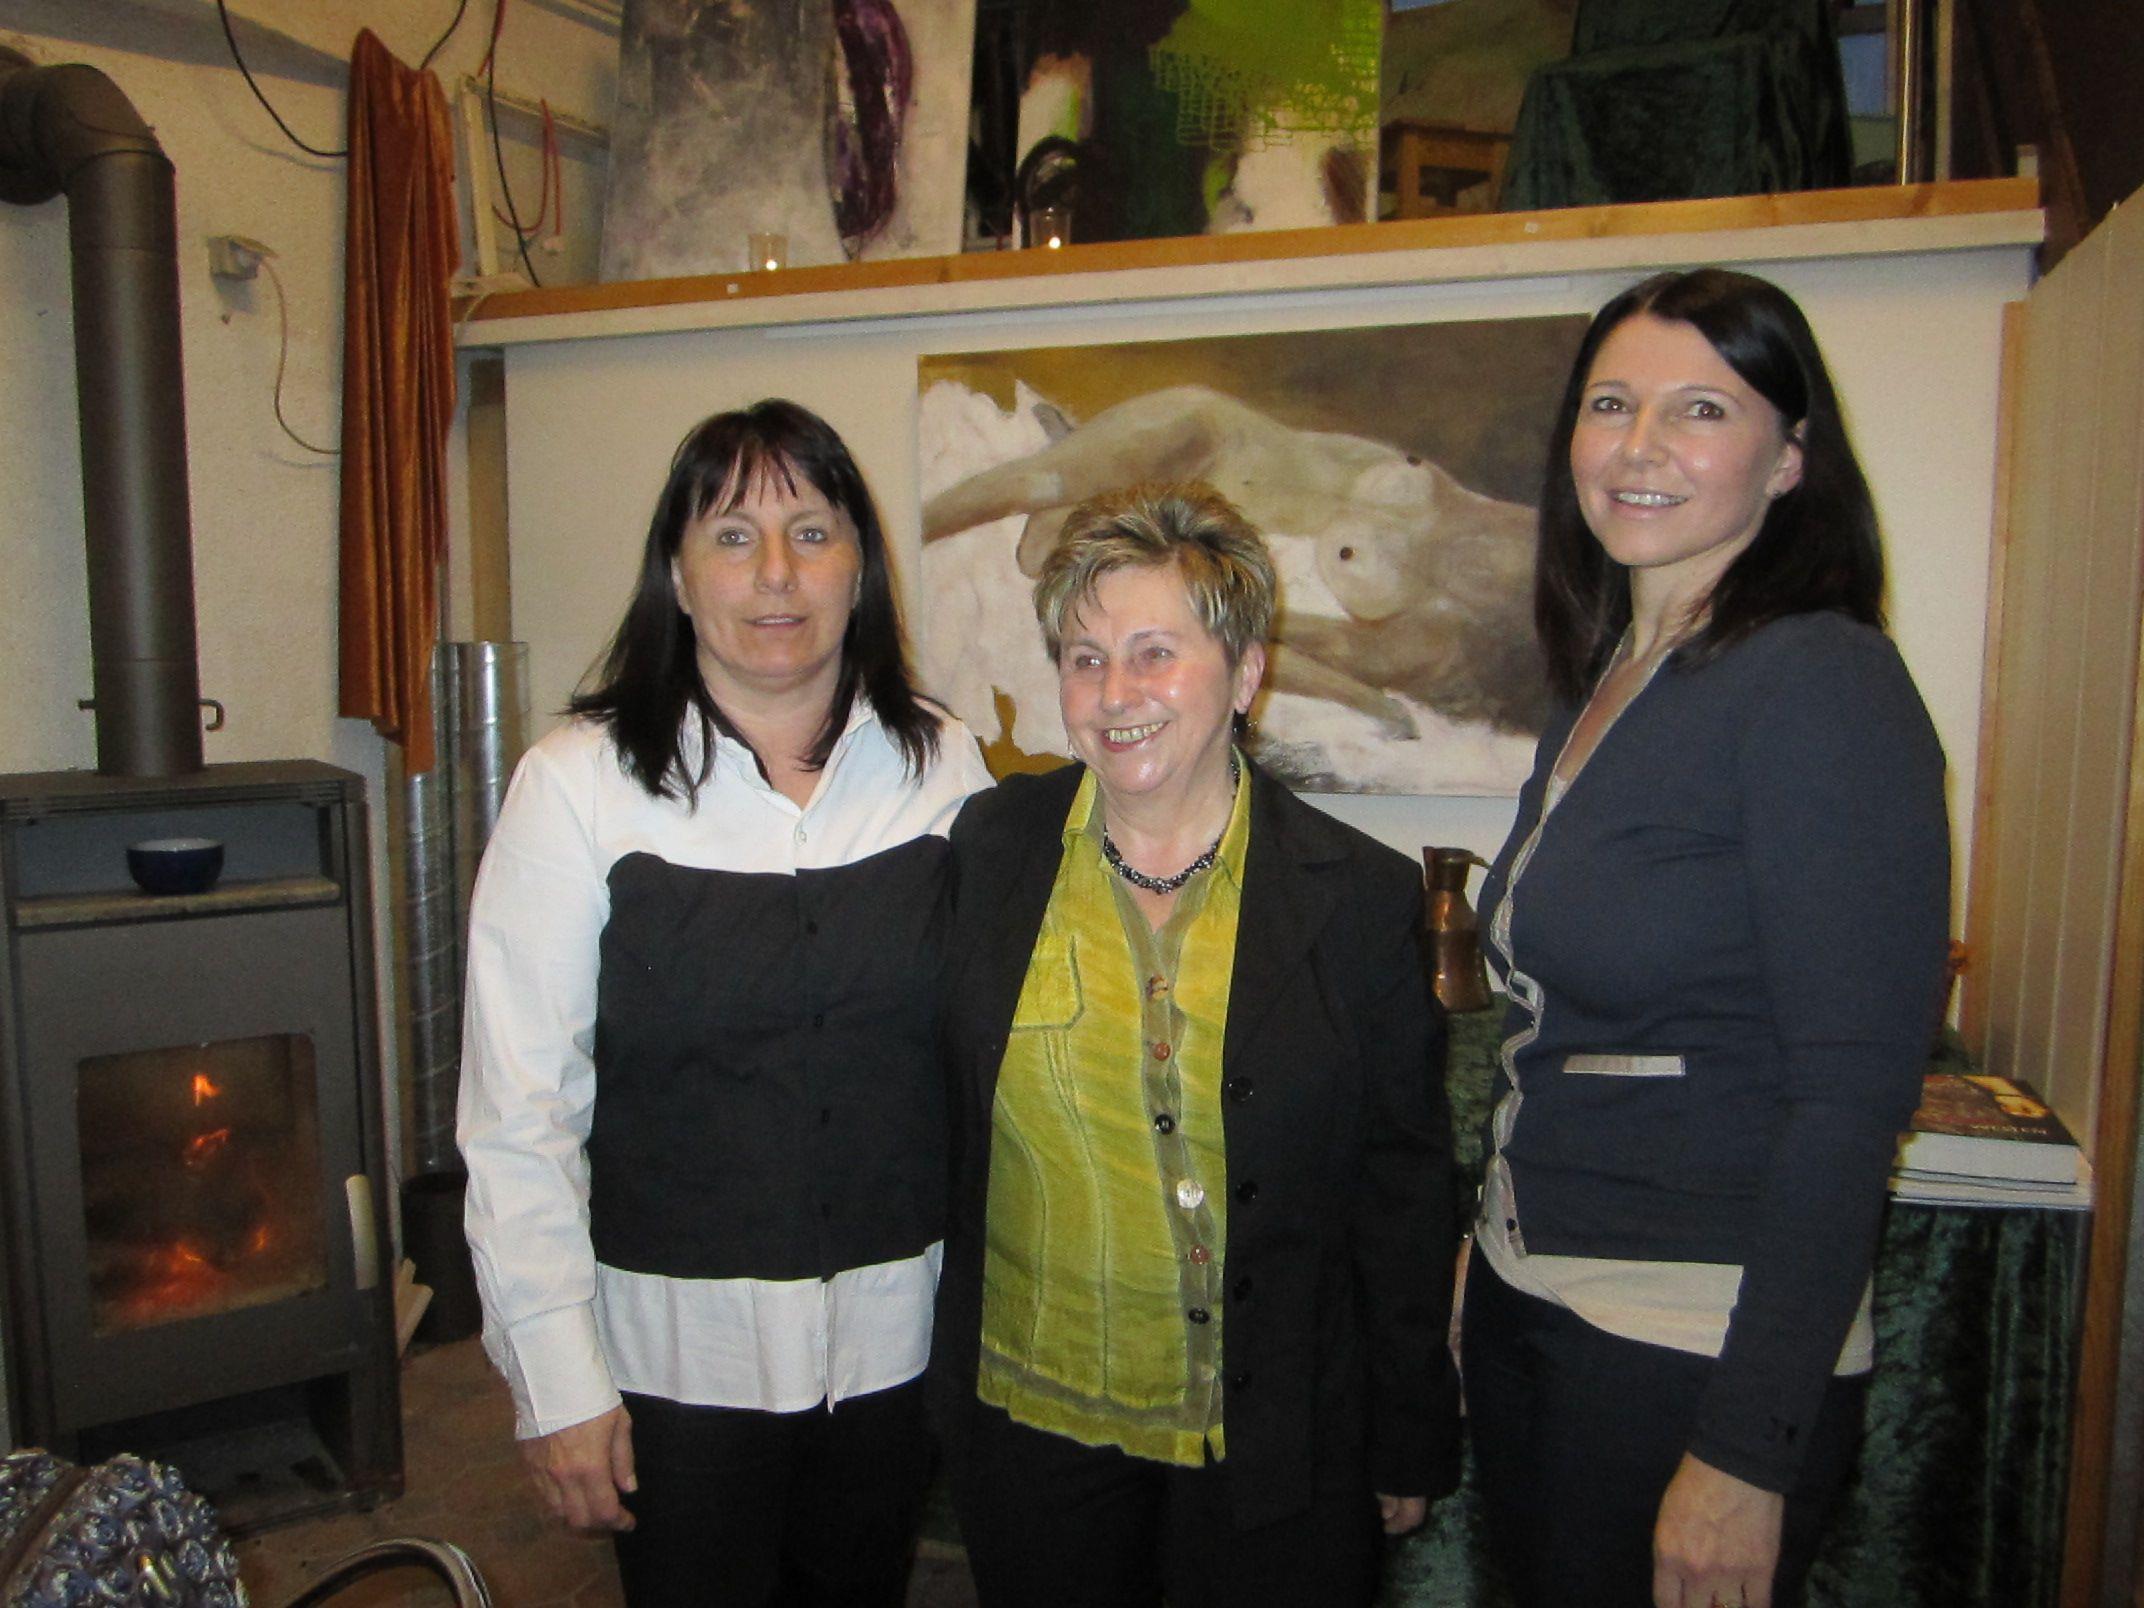 Hausherrin Sonja Köstl mit Künstlerin Gertraud Nagel und Vernissagerednerin Heidi Burda-Schuster